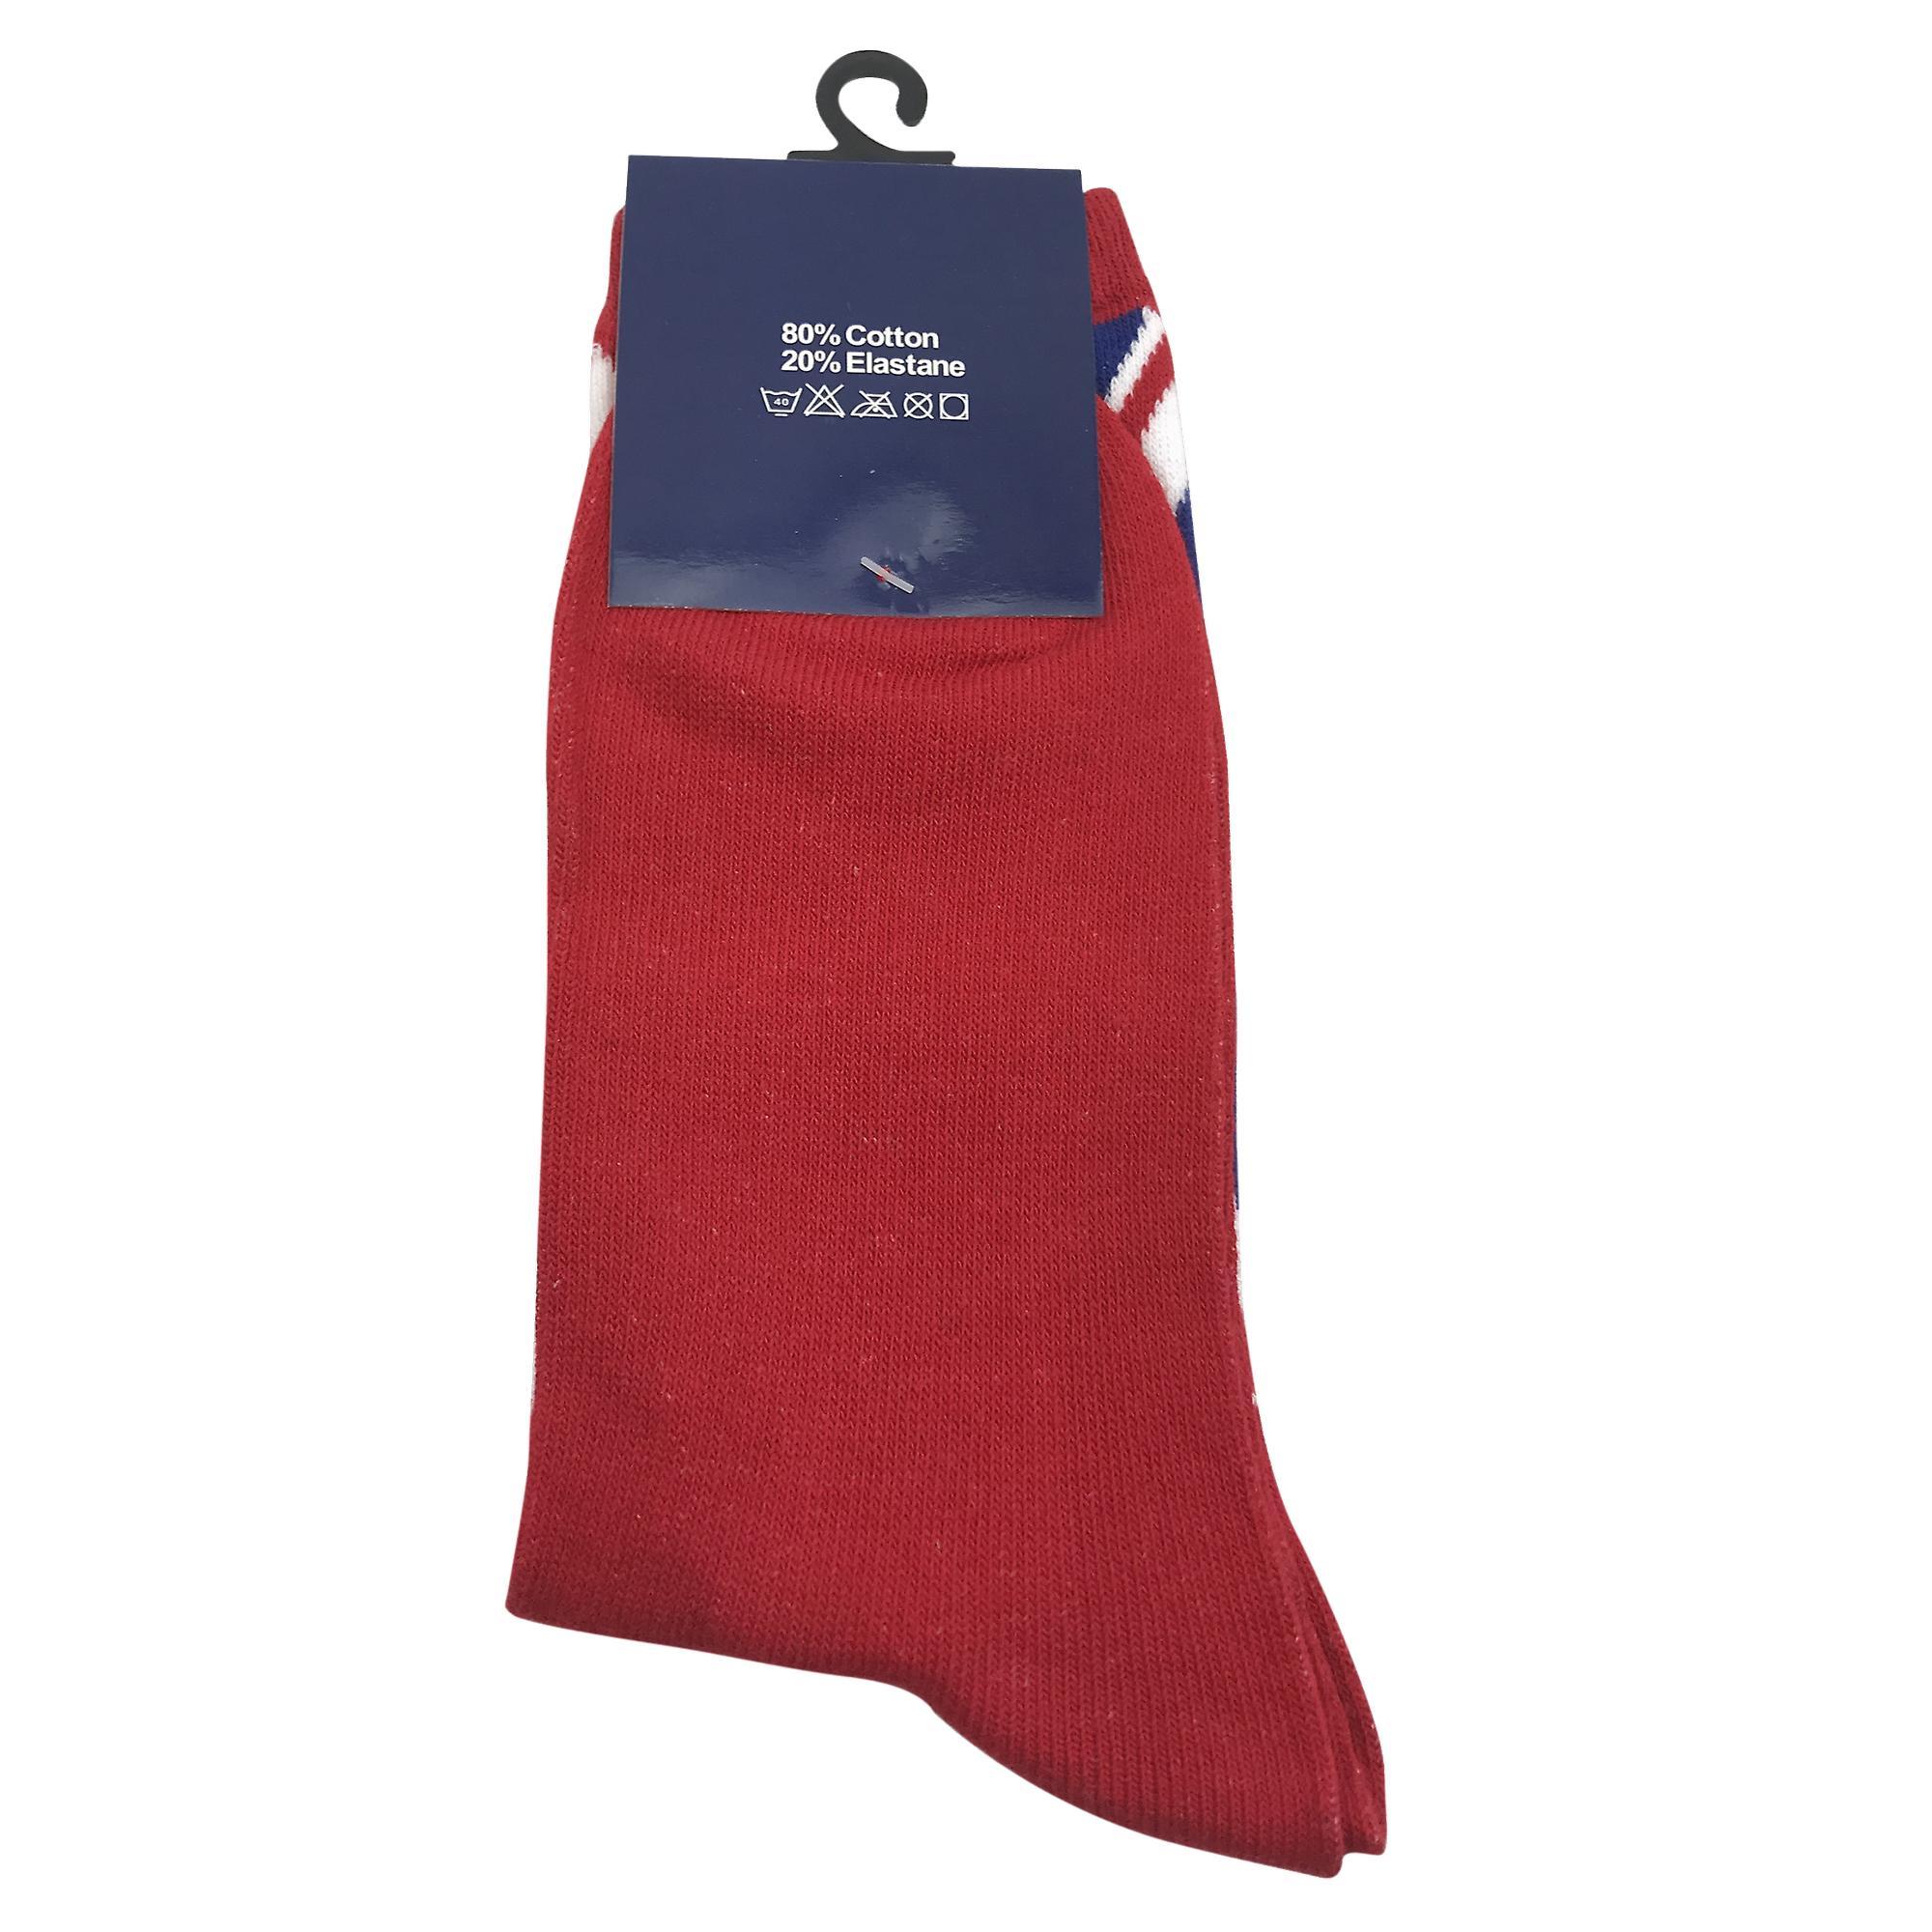 Ladies union jack sock red size 4-7 (uk)